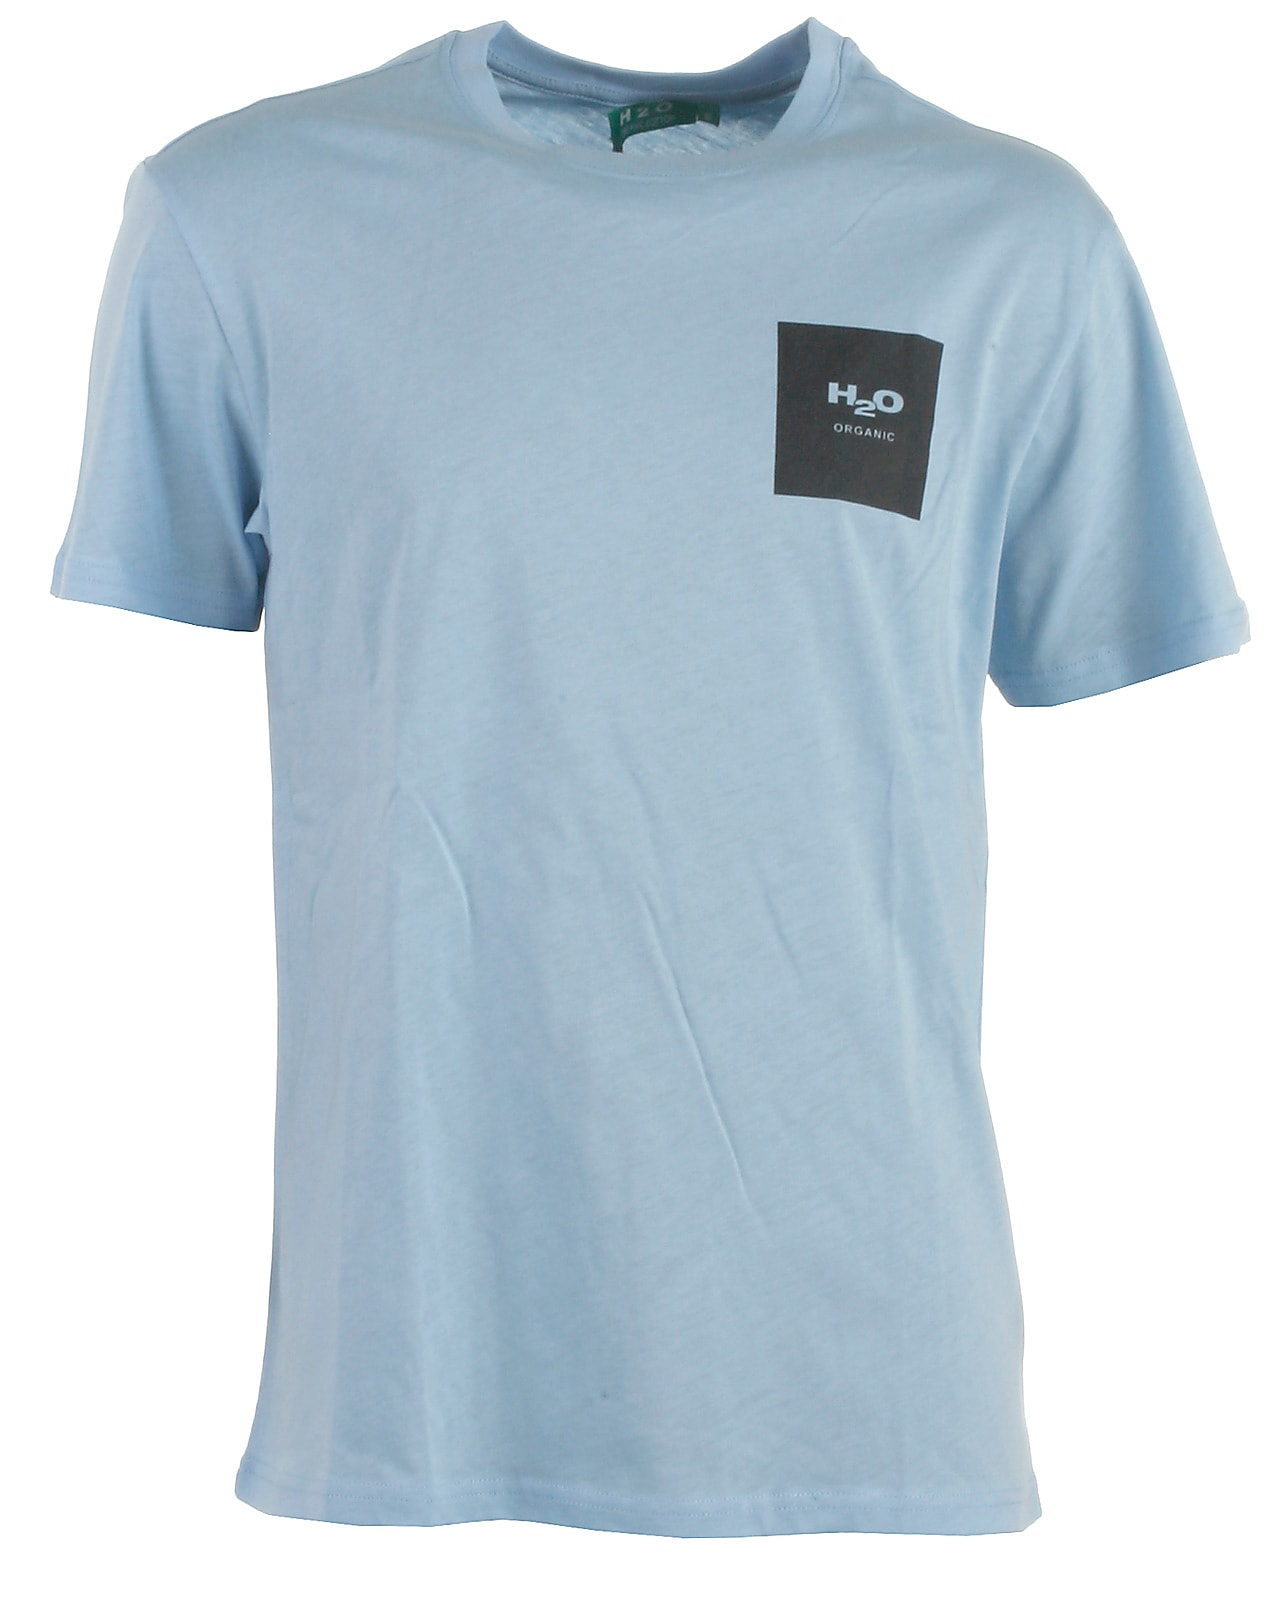 Image of H2O t-shirt s/s, Lyø, babyblue